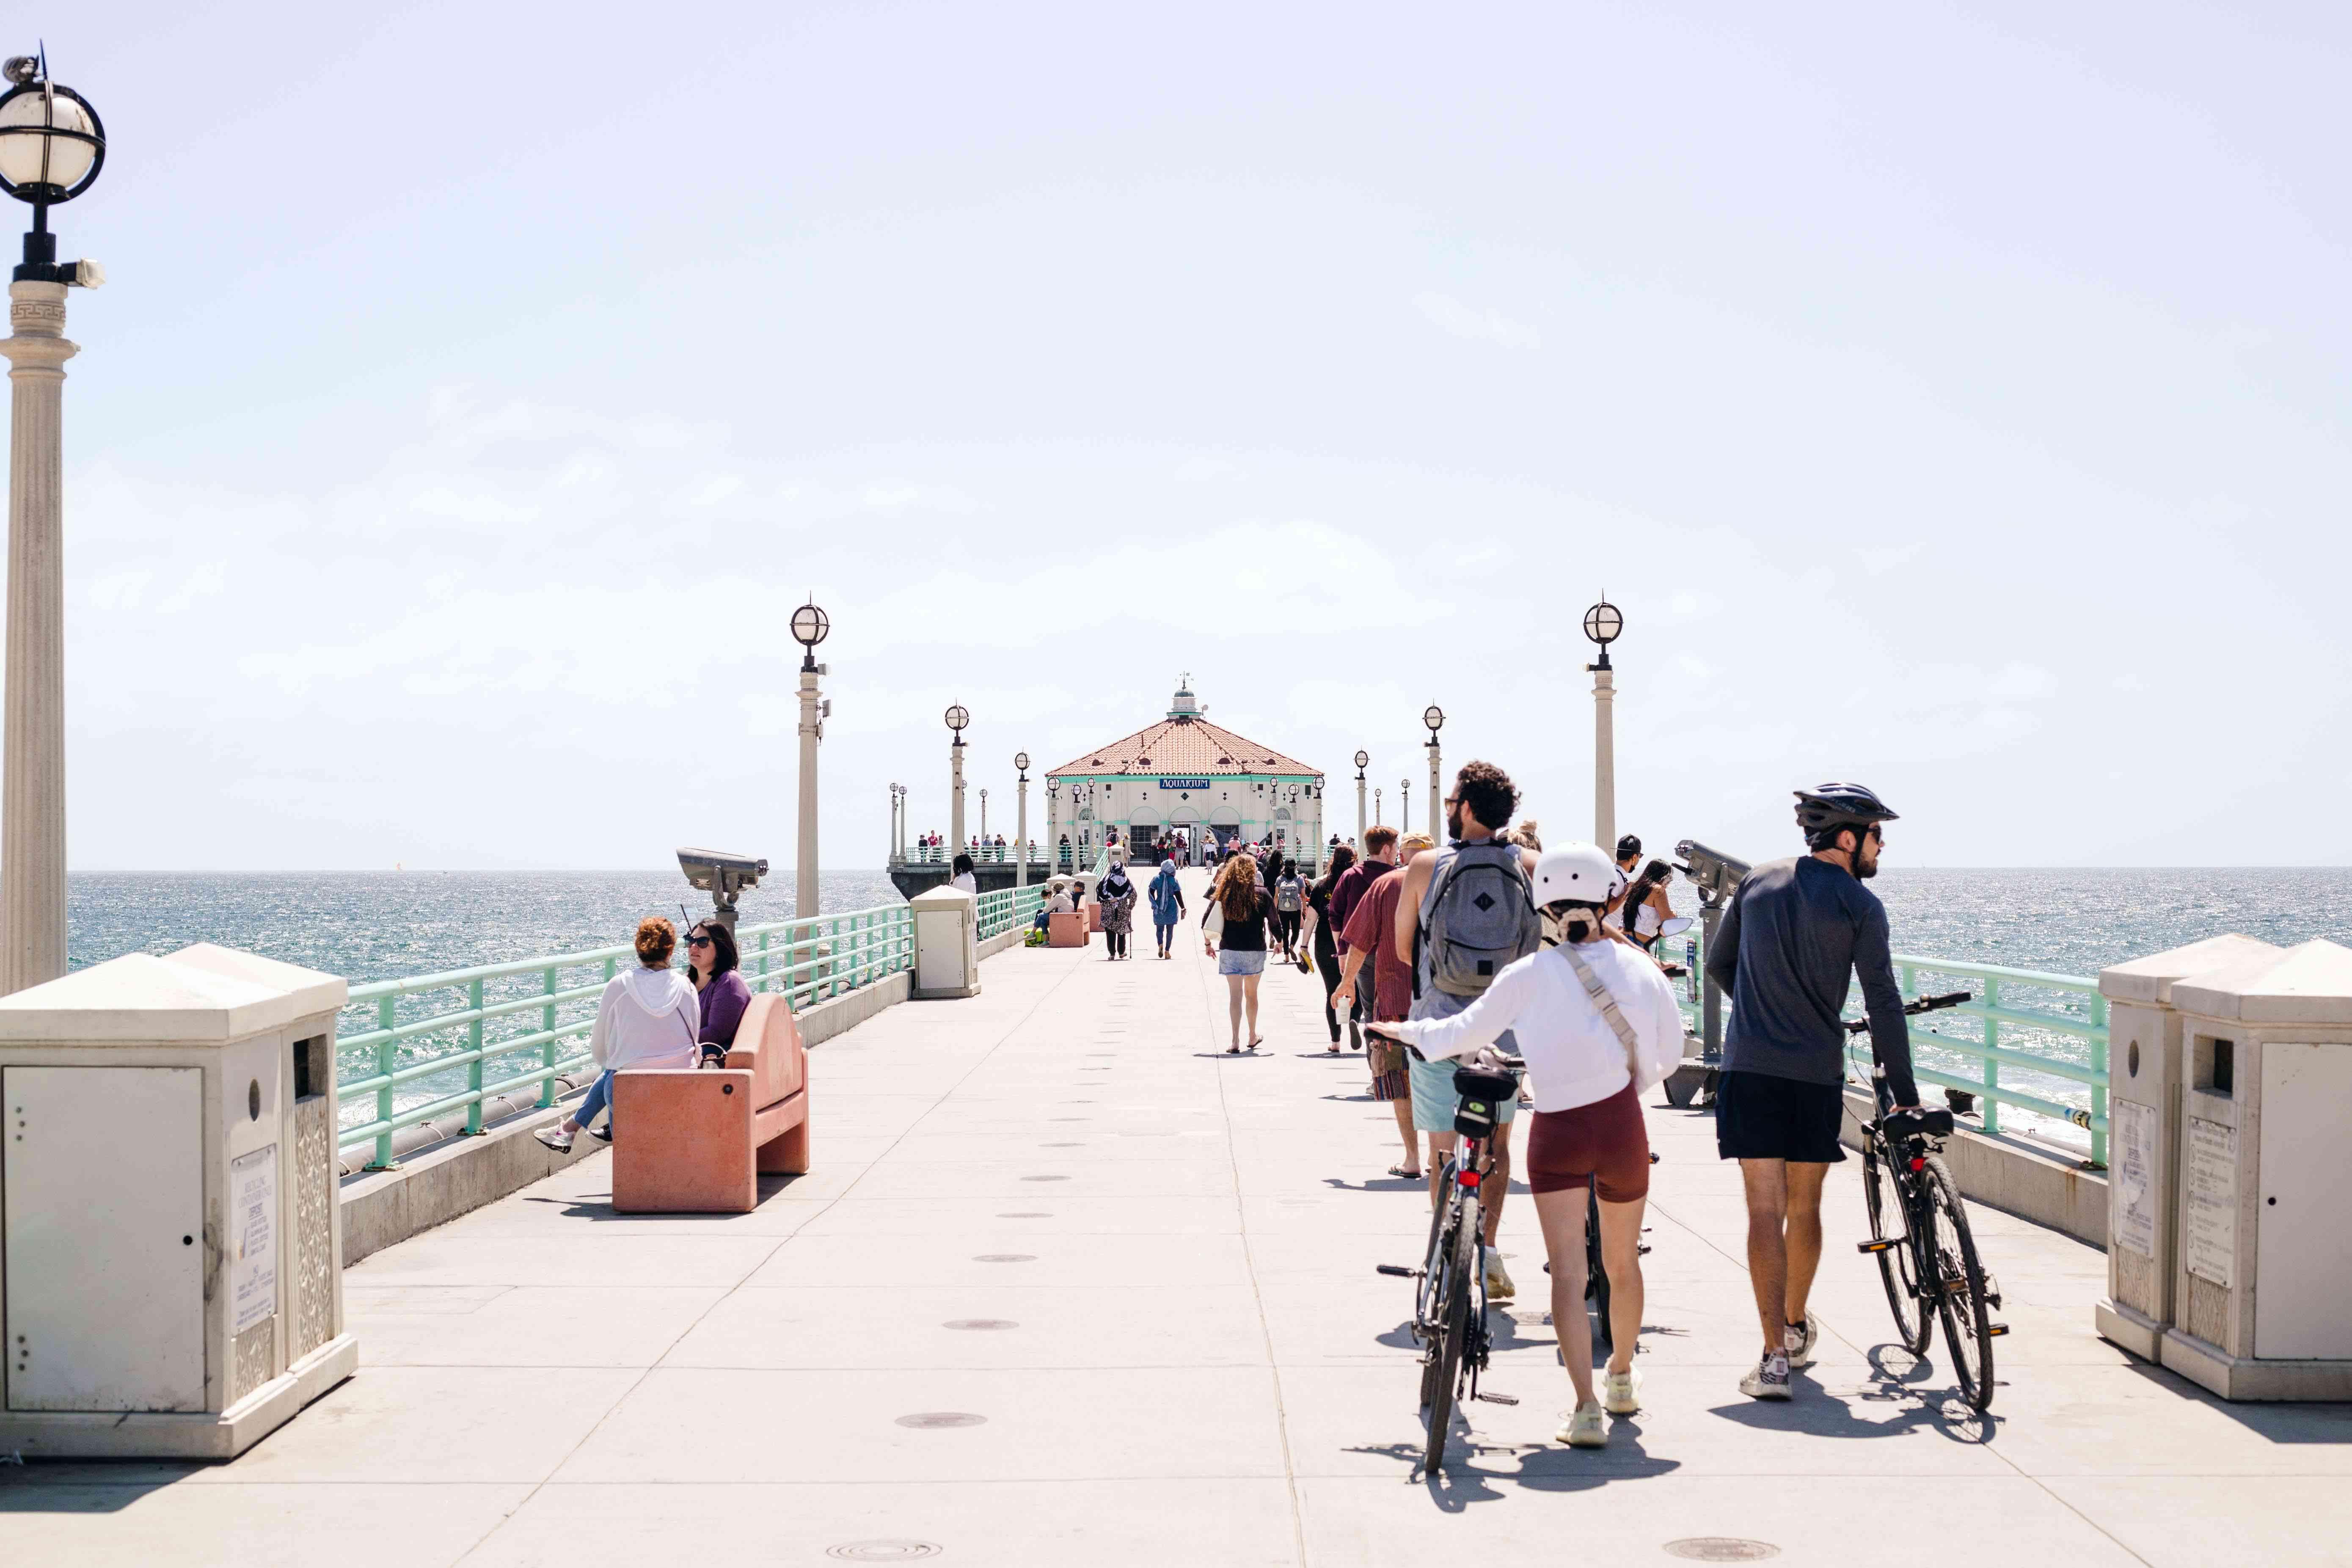 Manhattan Beach Pier in Los Angeles, CA